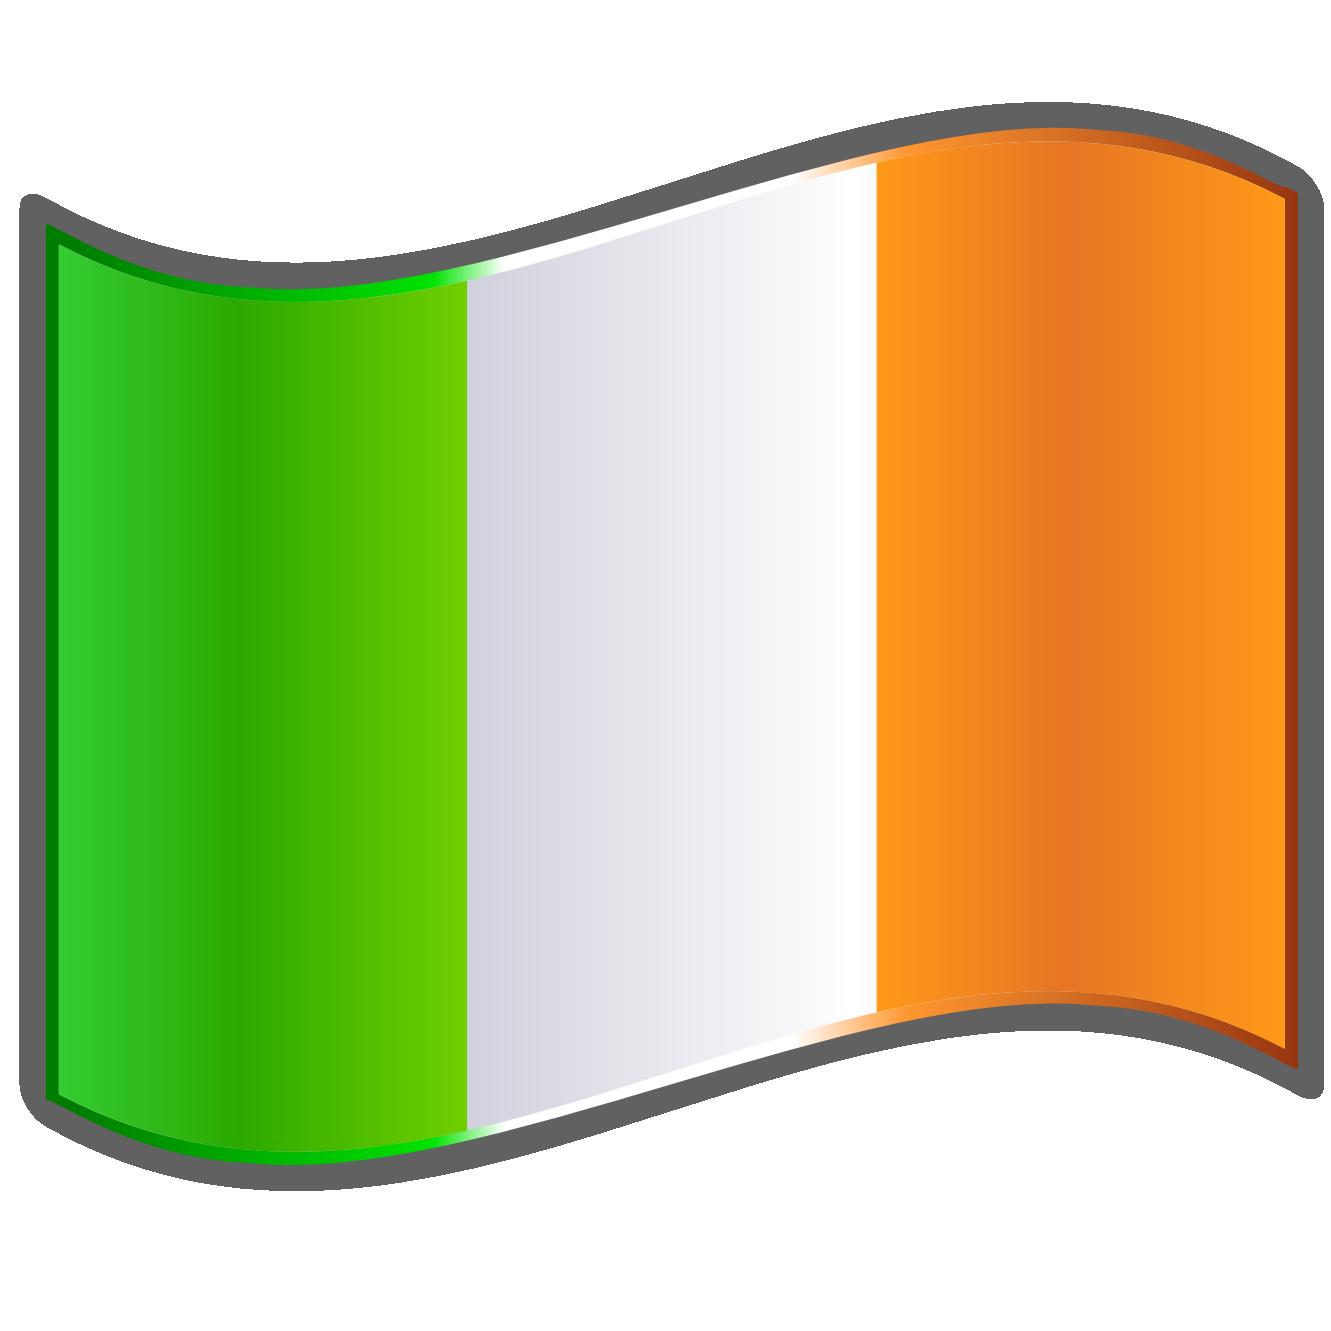 cliparts irland - photo #10